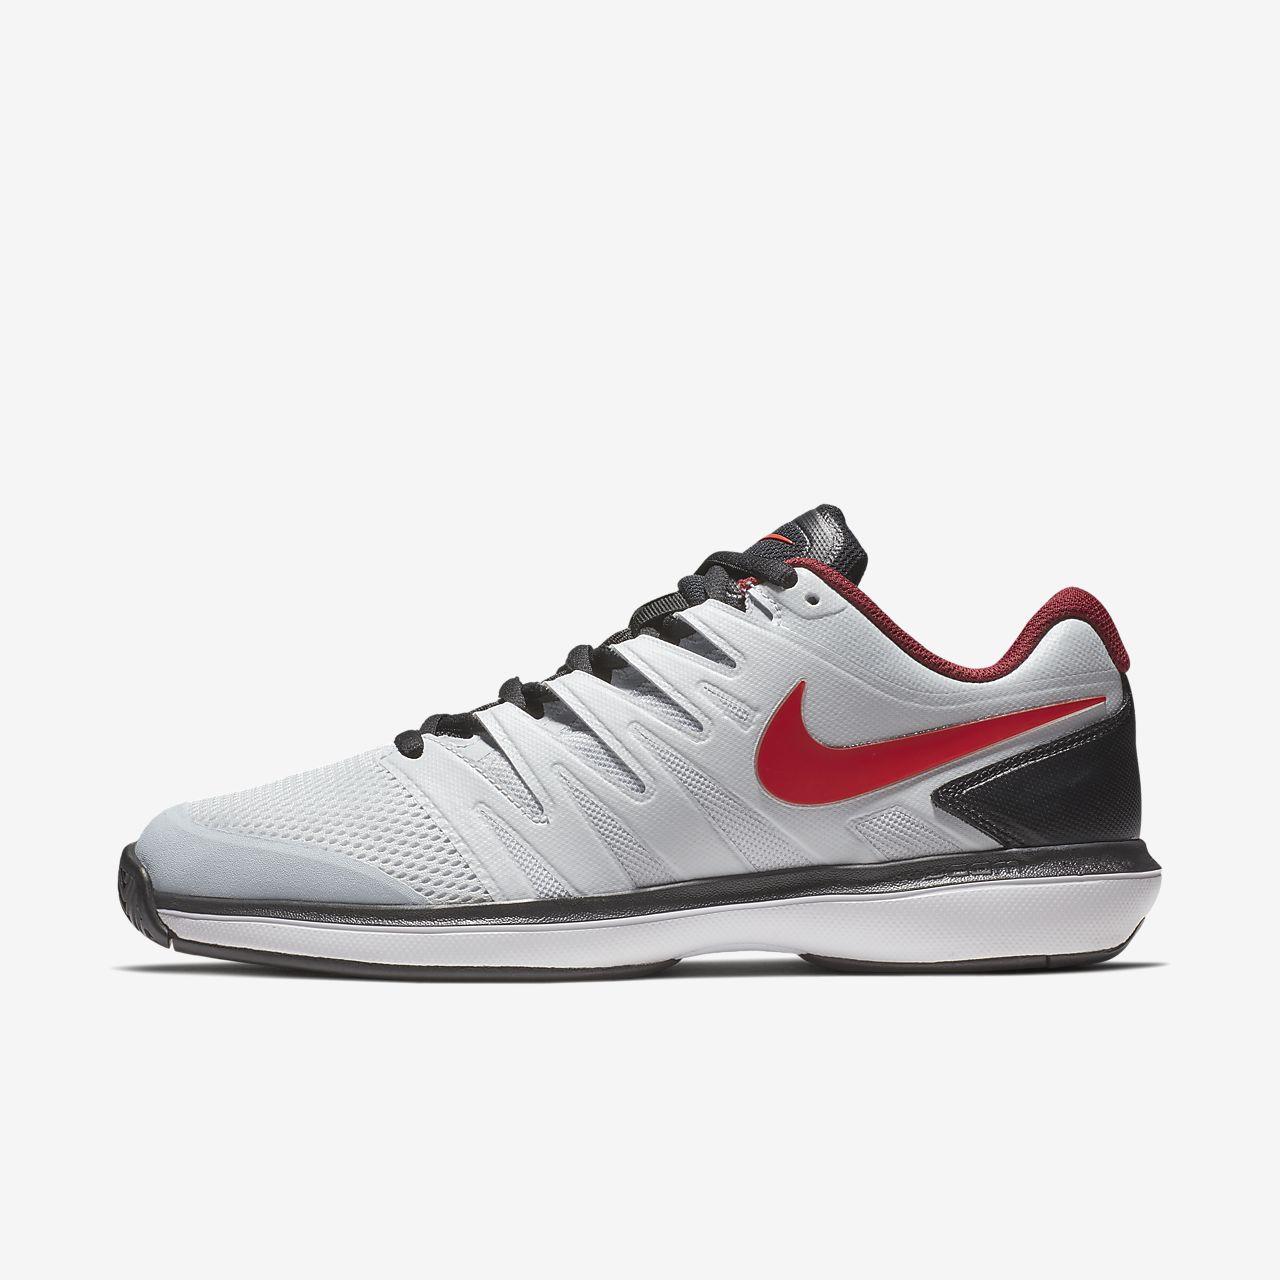 ... Nike Air Zoom Prestige HC Men's Tennis Shoe